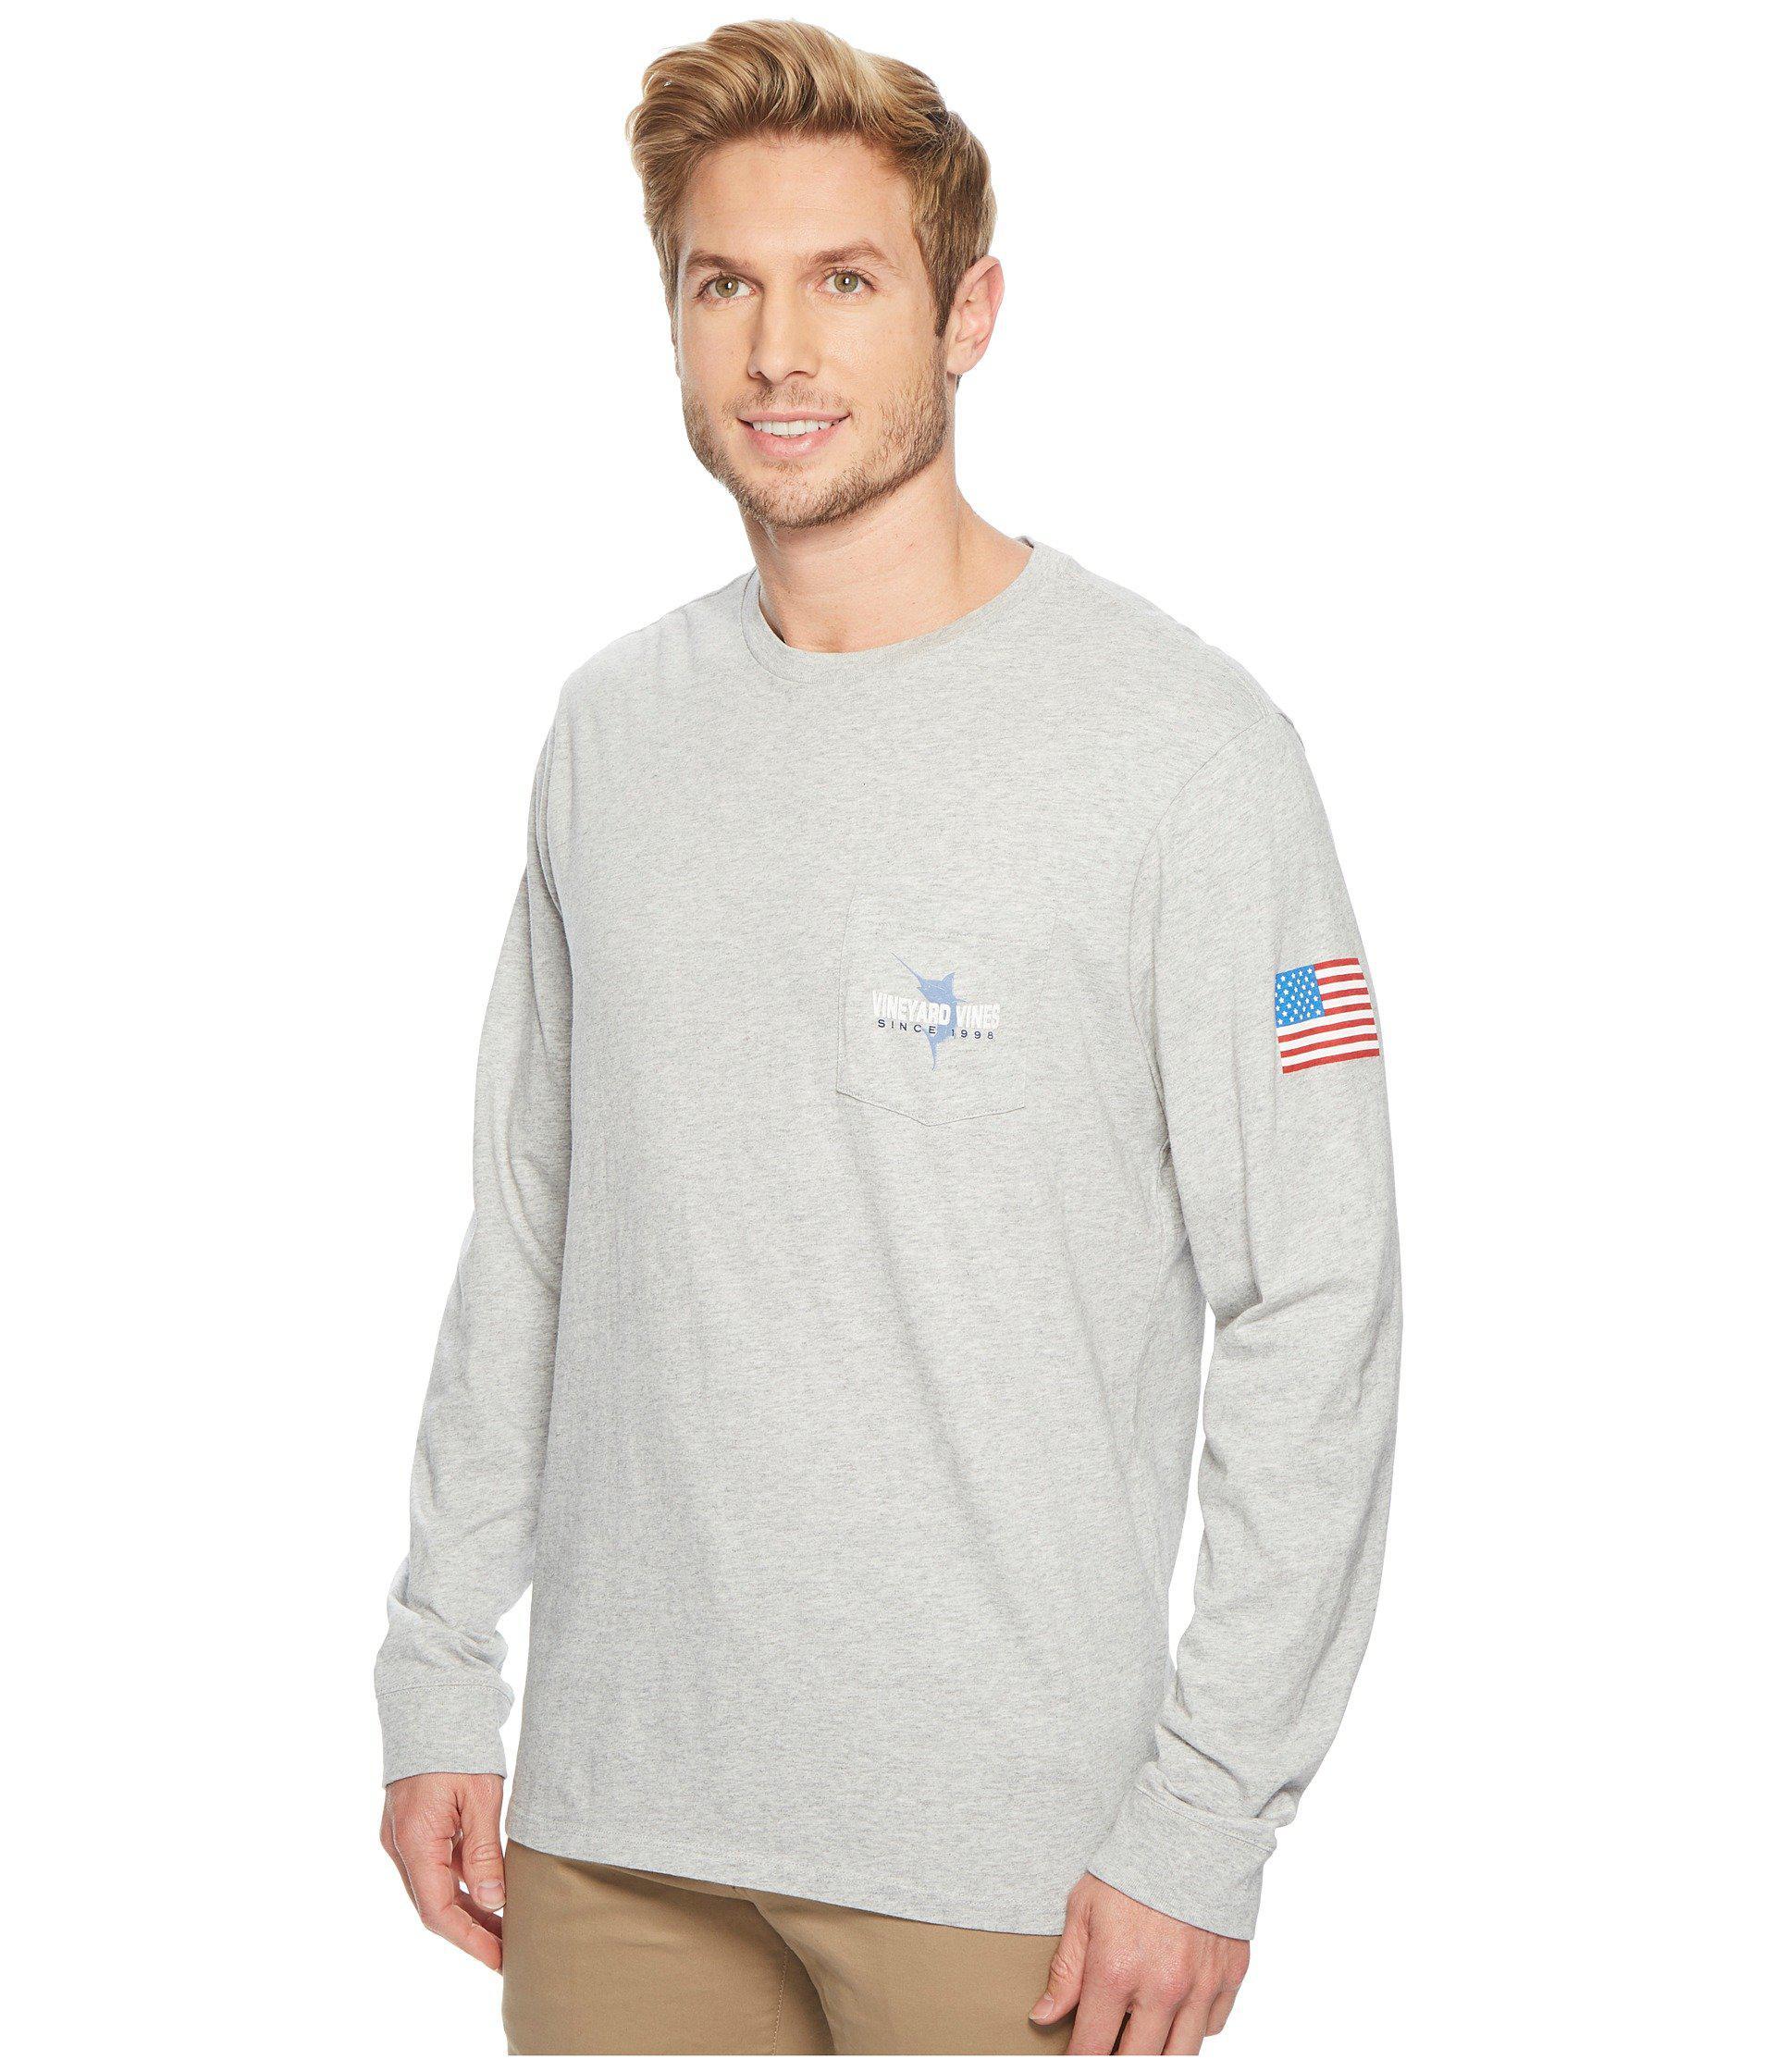 a79112a11 Lyst - Vineyard Vines Long Sleeve 98 Marlin Pocket Tee in Gray for Men